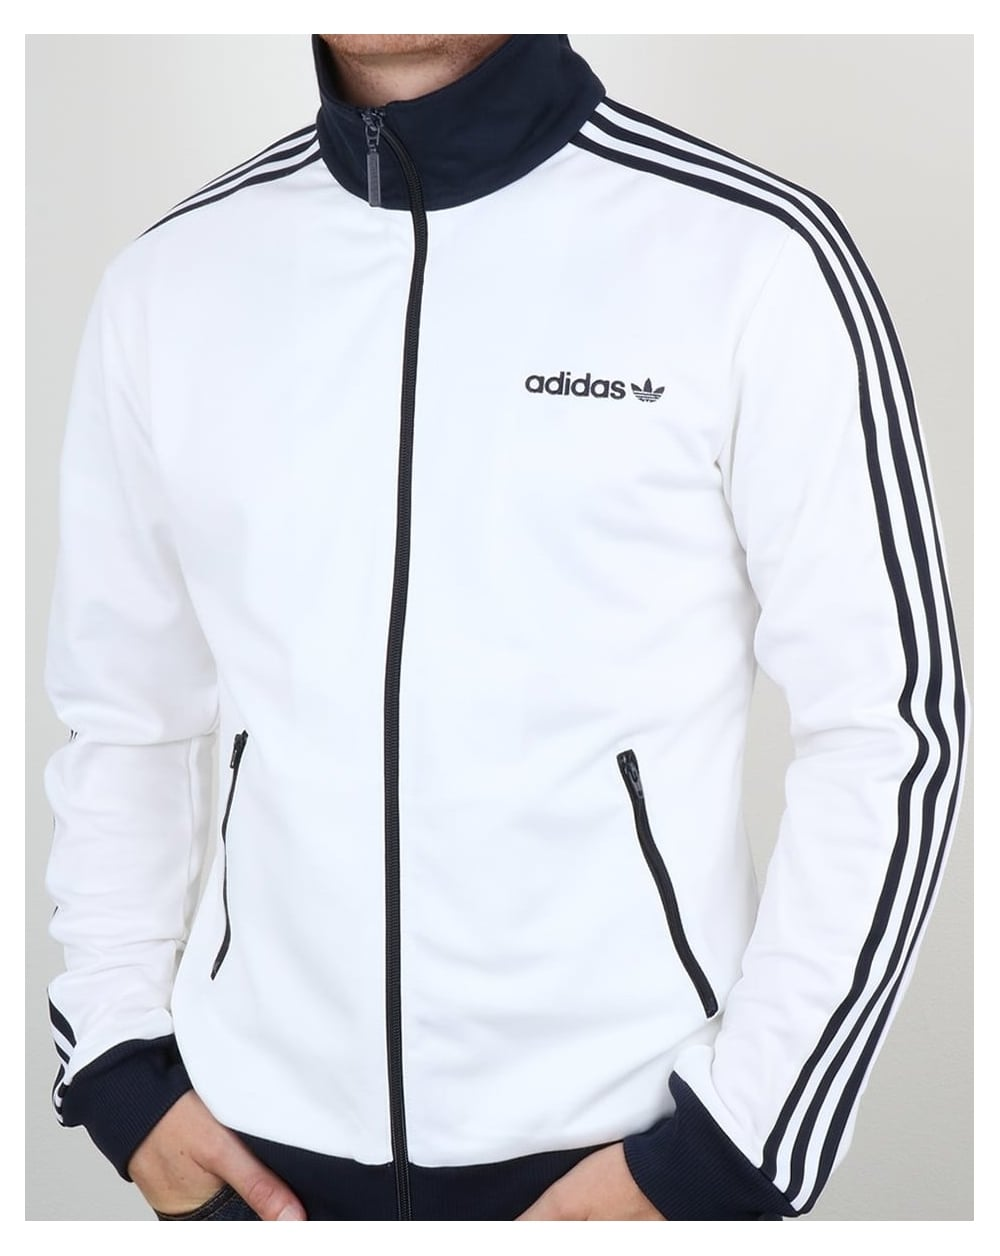 adidas beckenbauer track top white navy jacket originals black. Black Bedroom Furniture Sets. Home Design Ideas